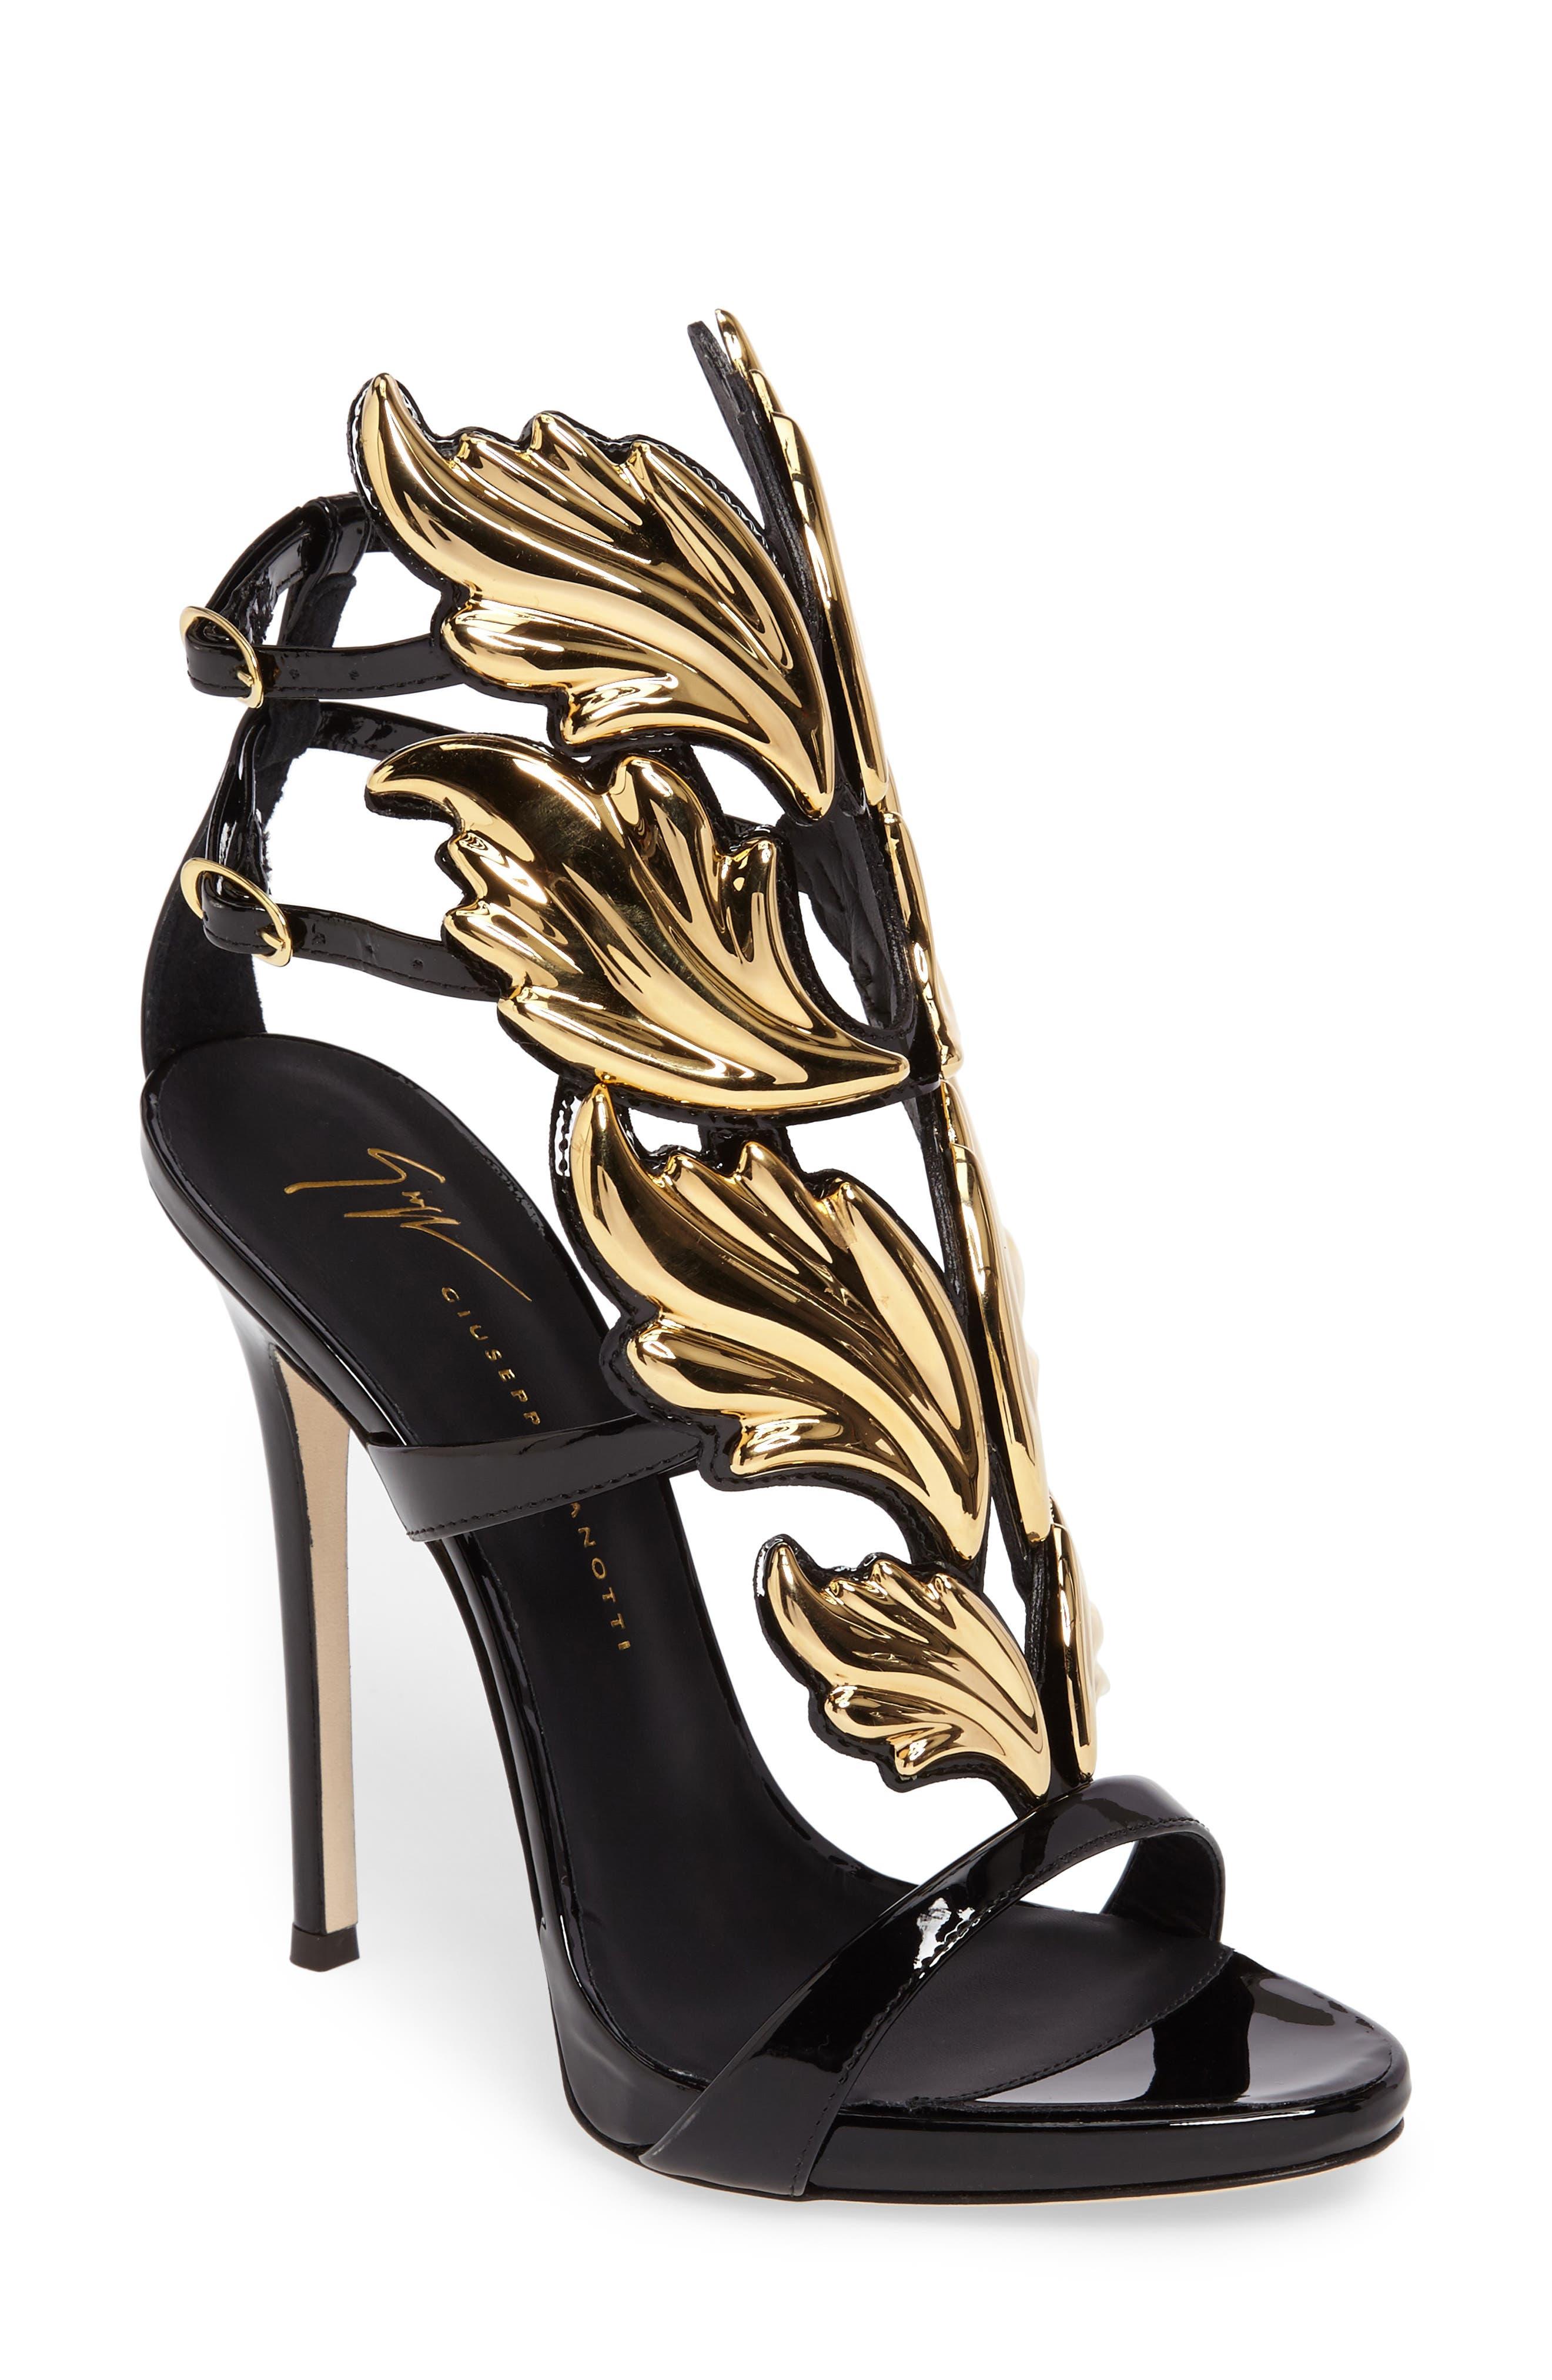 Giuseppe Zanotti Cruel Leather Sandal Heels Gold K8717